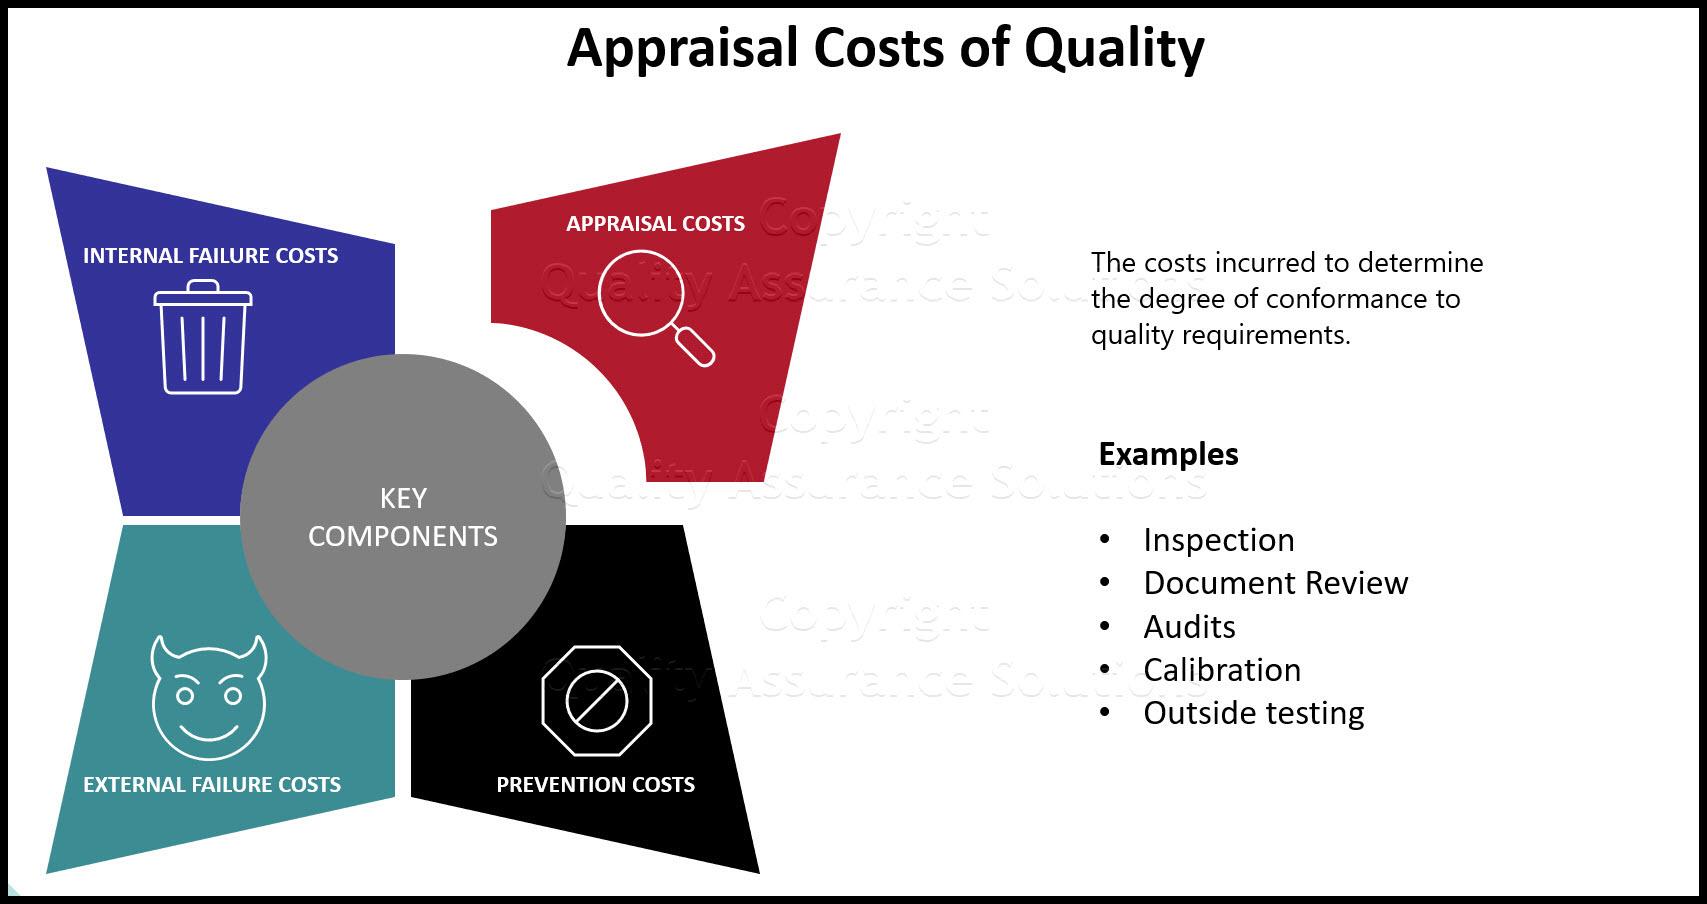 Appraisal Costs slide